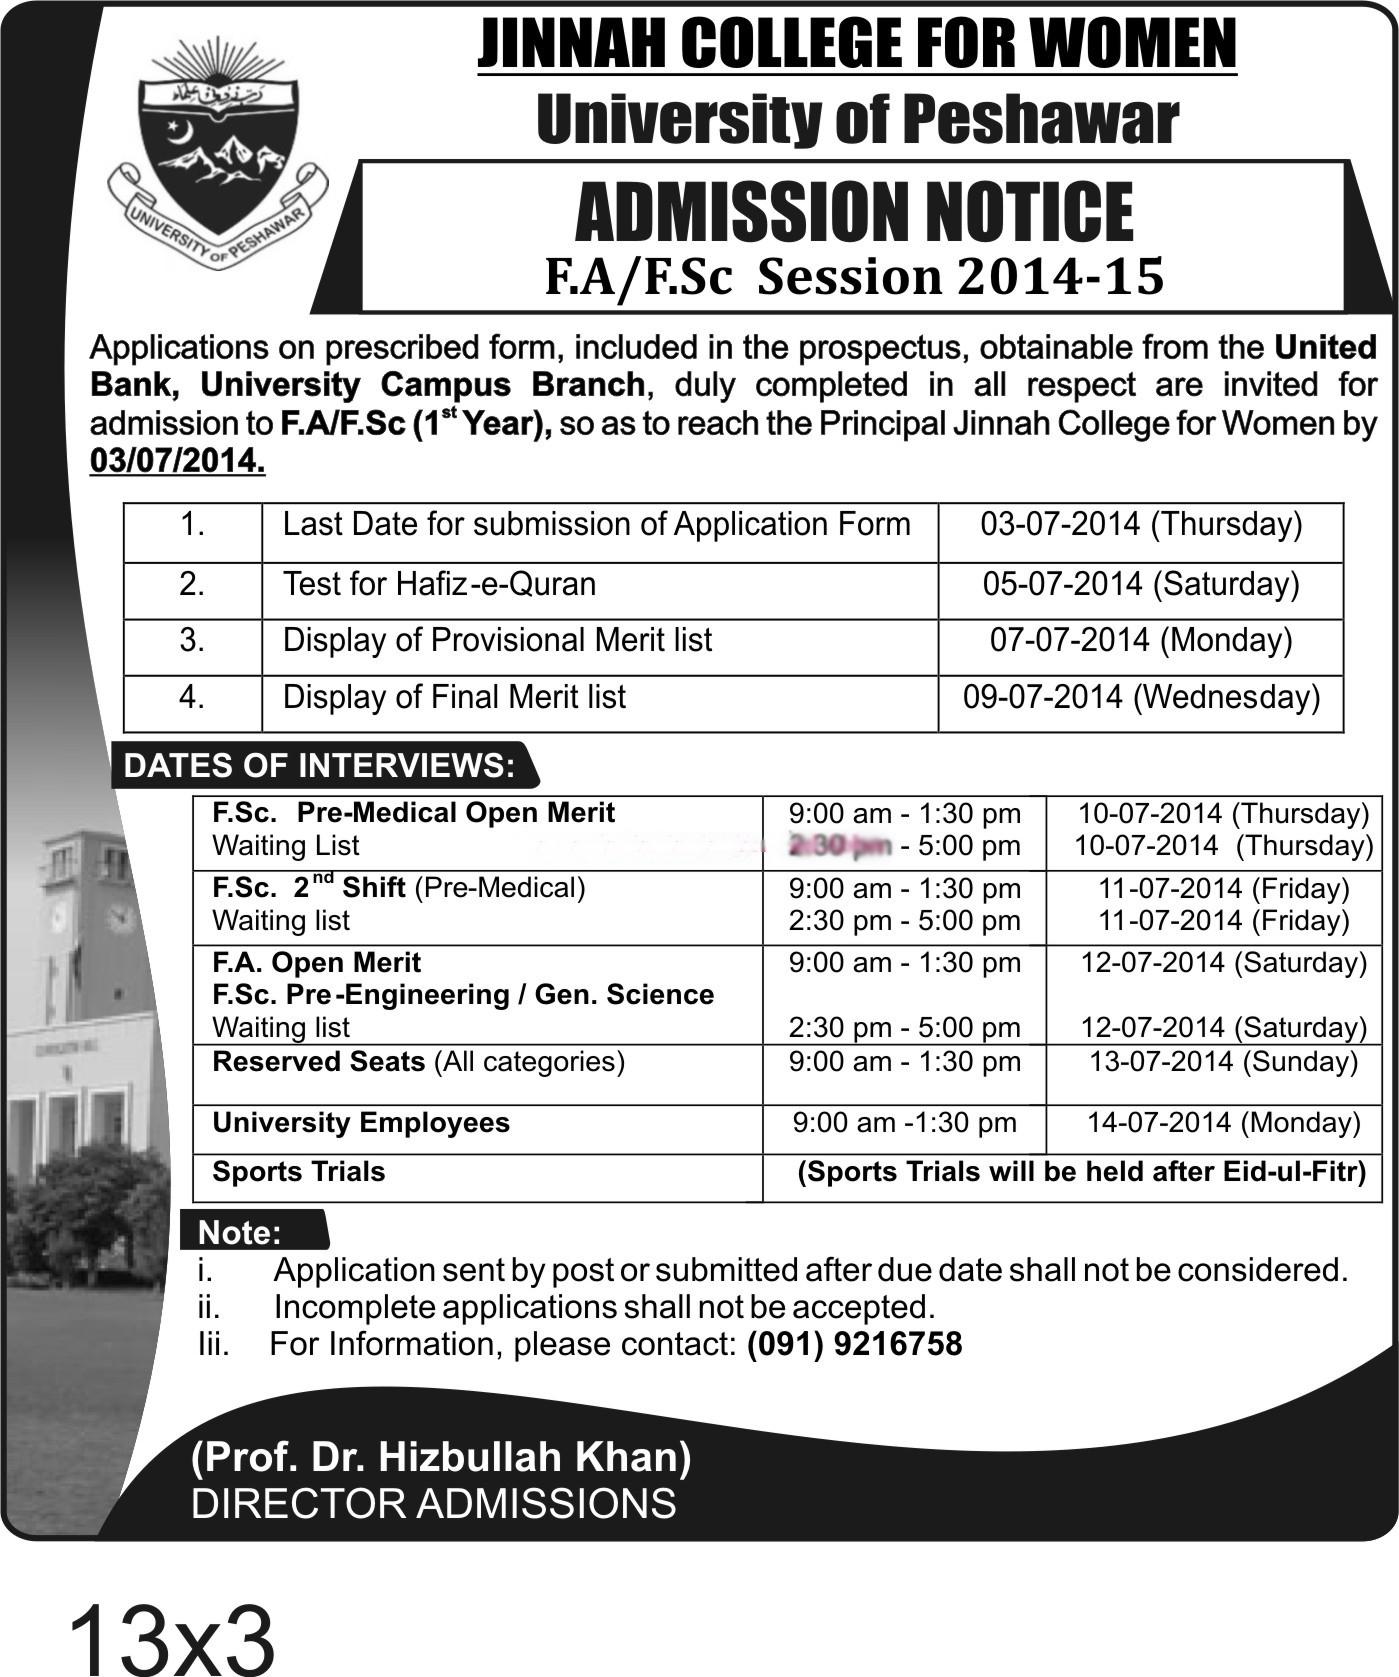 Jinnah College for Women Peshawar Admission Merit Lists 2014